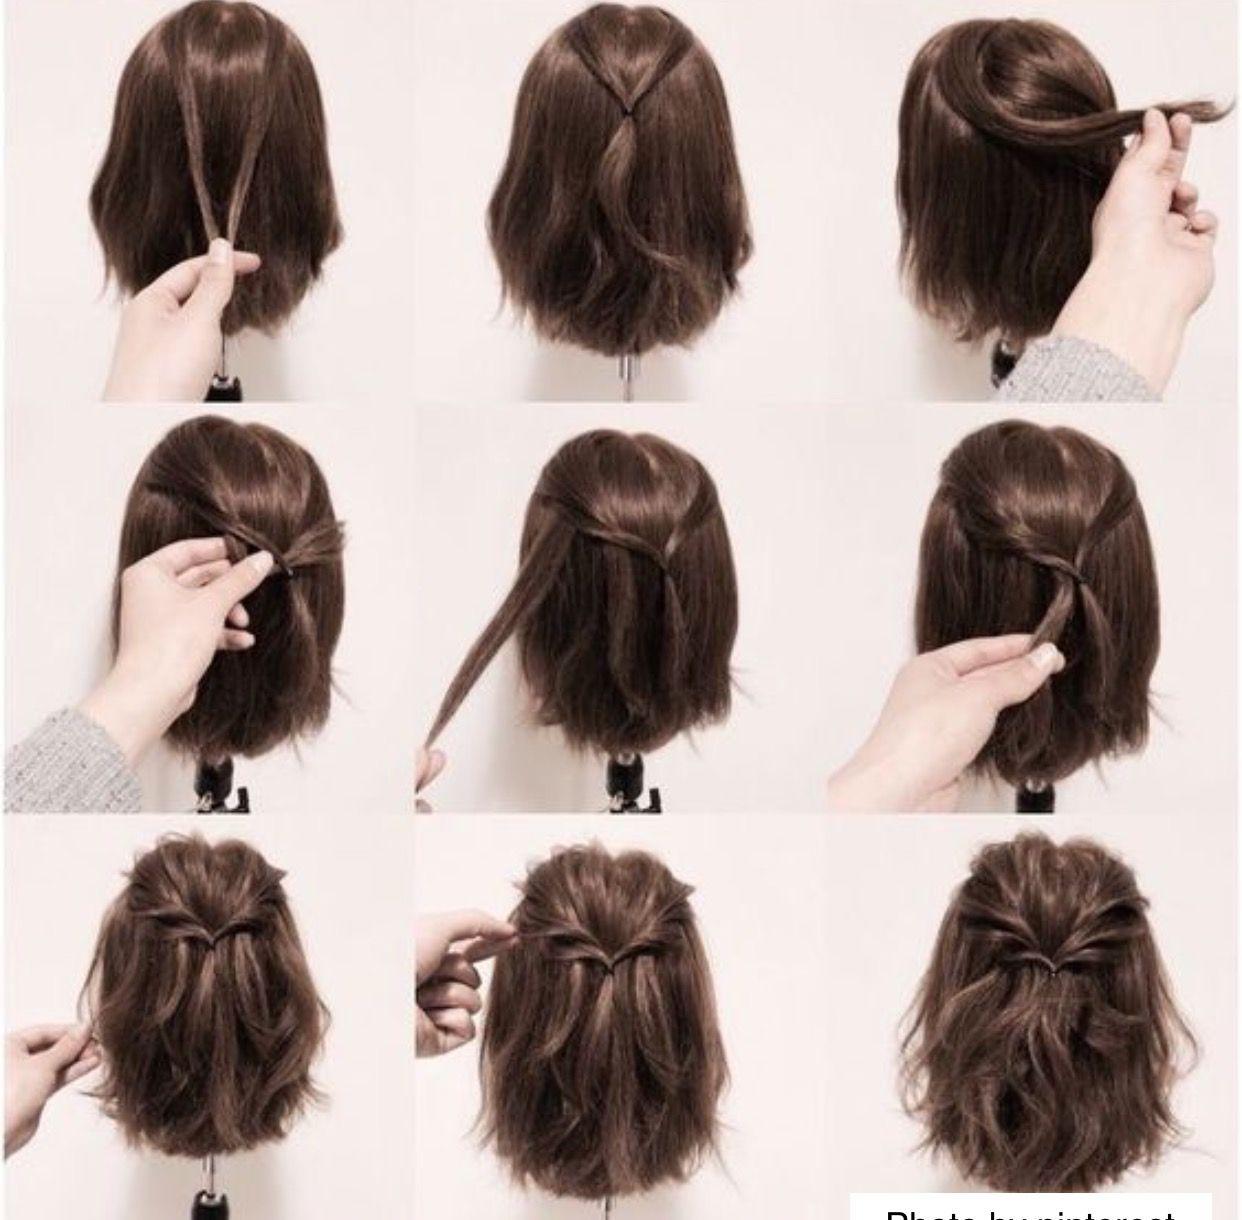 Http Niffler Elm Tumblr Com Post 157400903821 Short Curly Weave Hairstyles For Women Short Penteados Penteado Cabelo Curto Cabelo Penteado